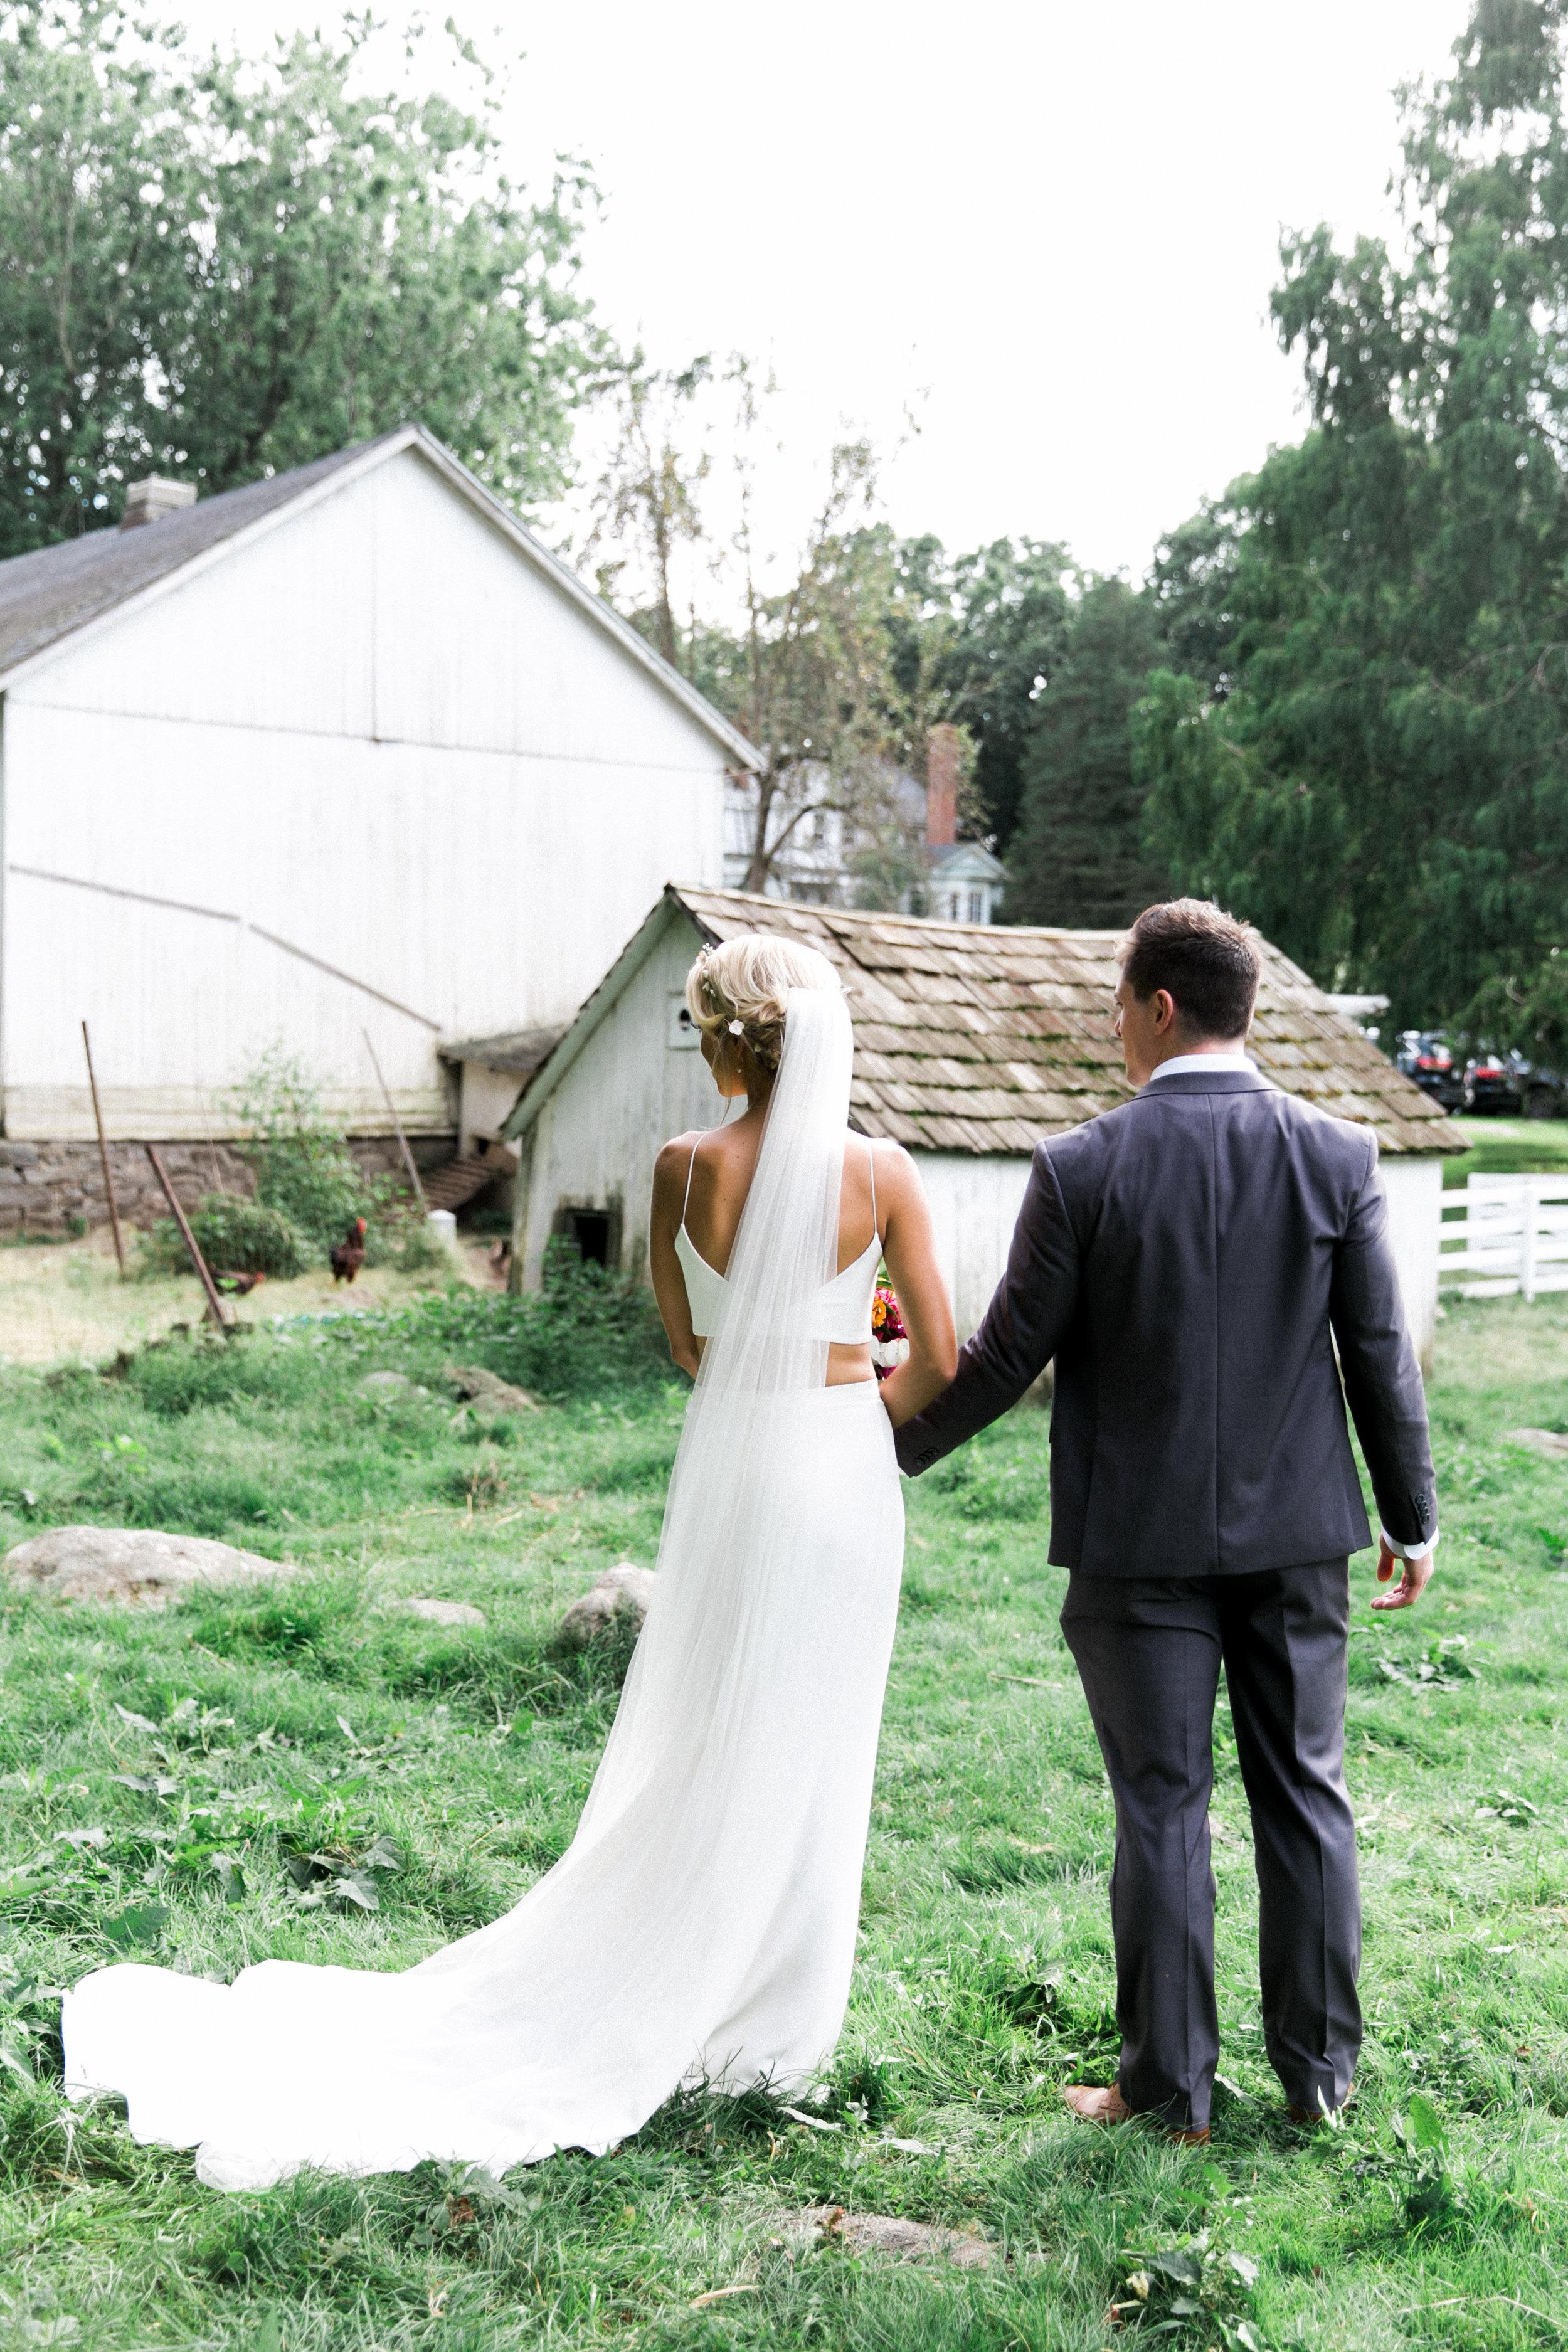 Barberry-Hill-Farm-Wedding-Madison-CT-Emily-and-Dan-August-2018-Connecticut-Wedd-0009.jpg